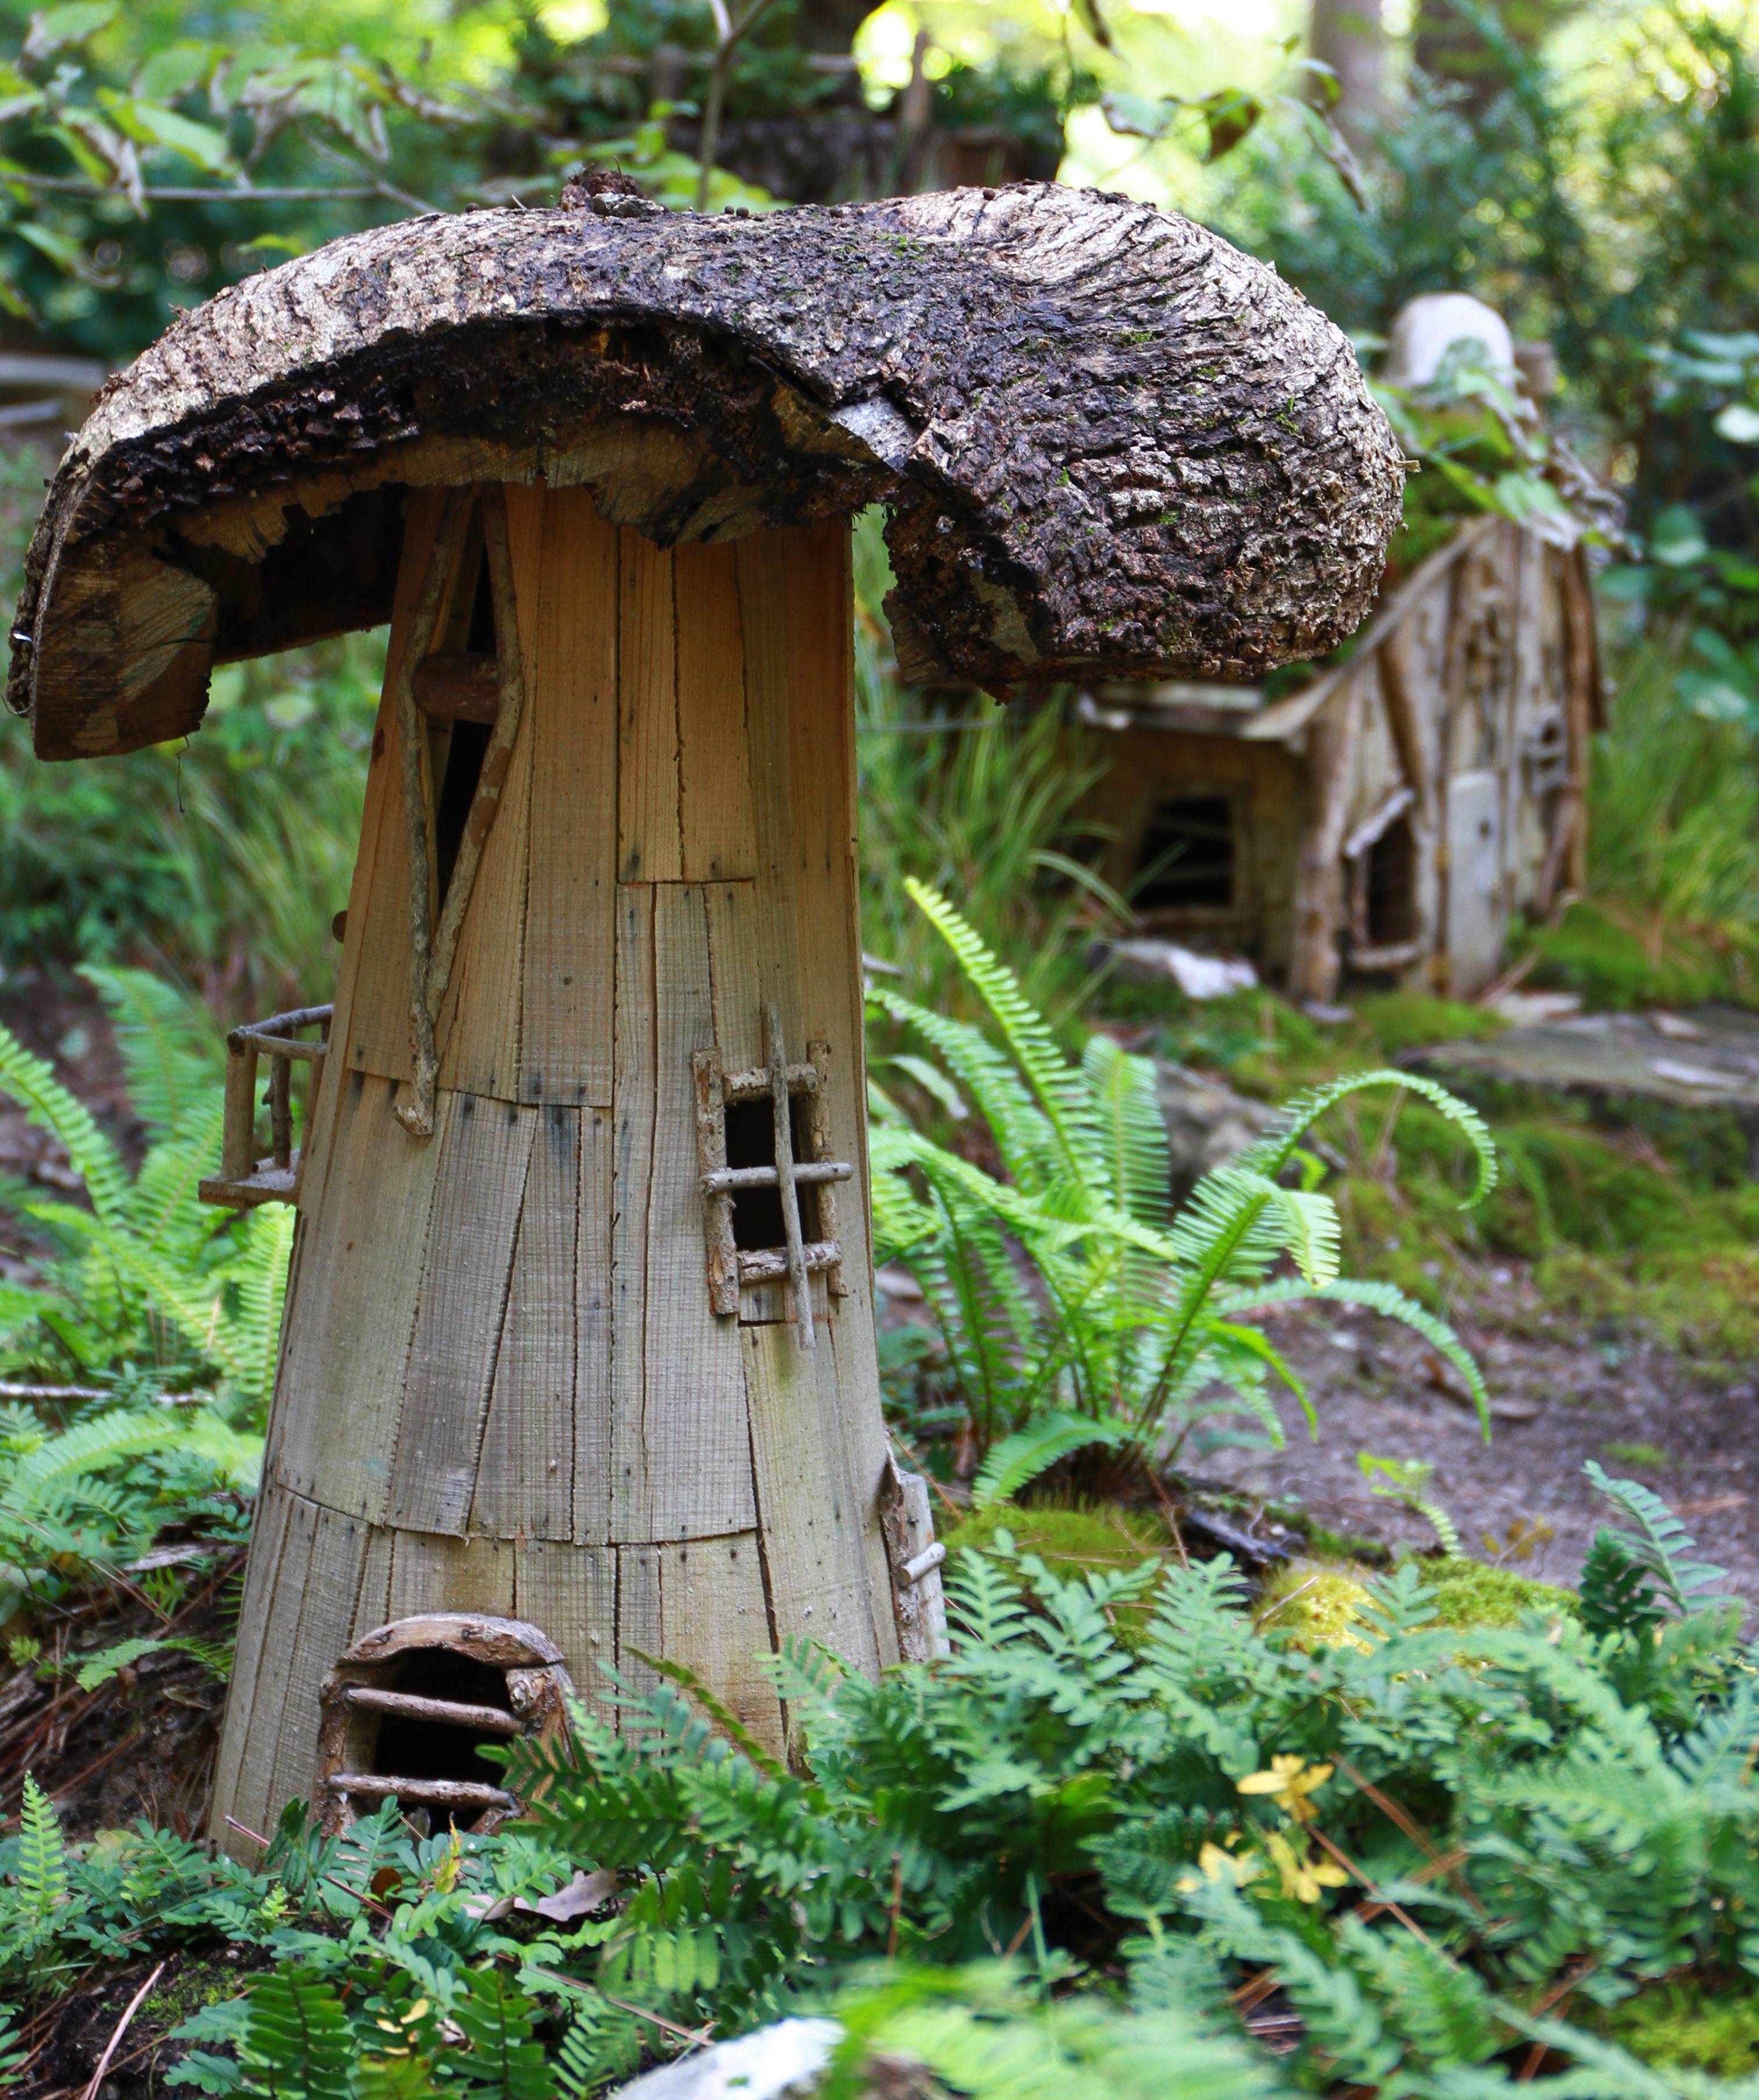 ... attraction, scale, garden, miniature, fungus, children, rainforest, little, fantasy, story, us, woodland, imagination, habitat, arkansas, hot springs, ...